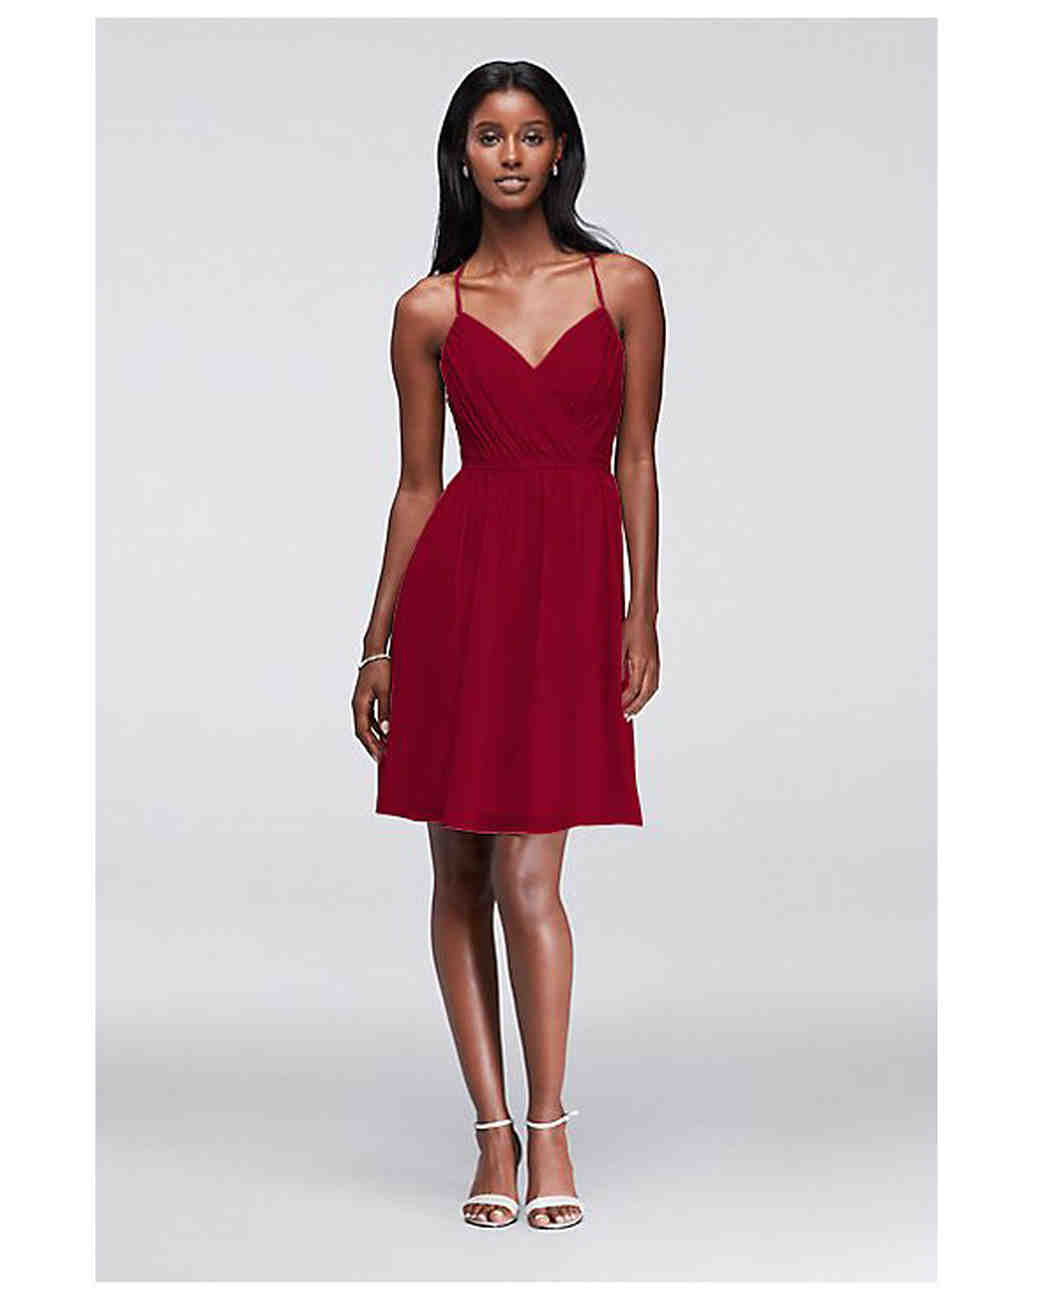 db62e27a1e63 28 of Our Favorite Short Bridesmaids' Dresses | Martha Stewart Weddings